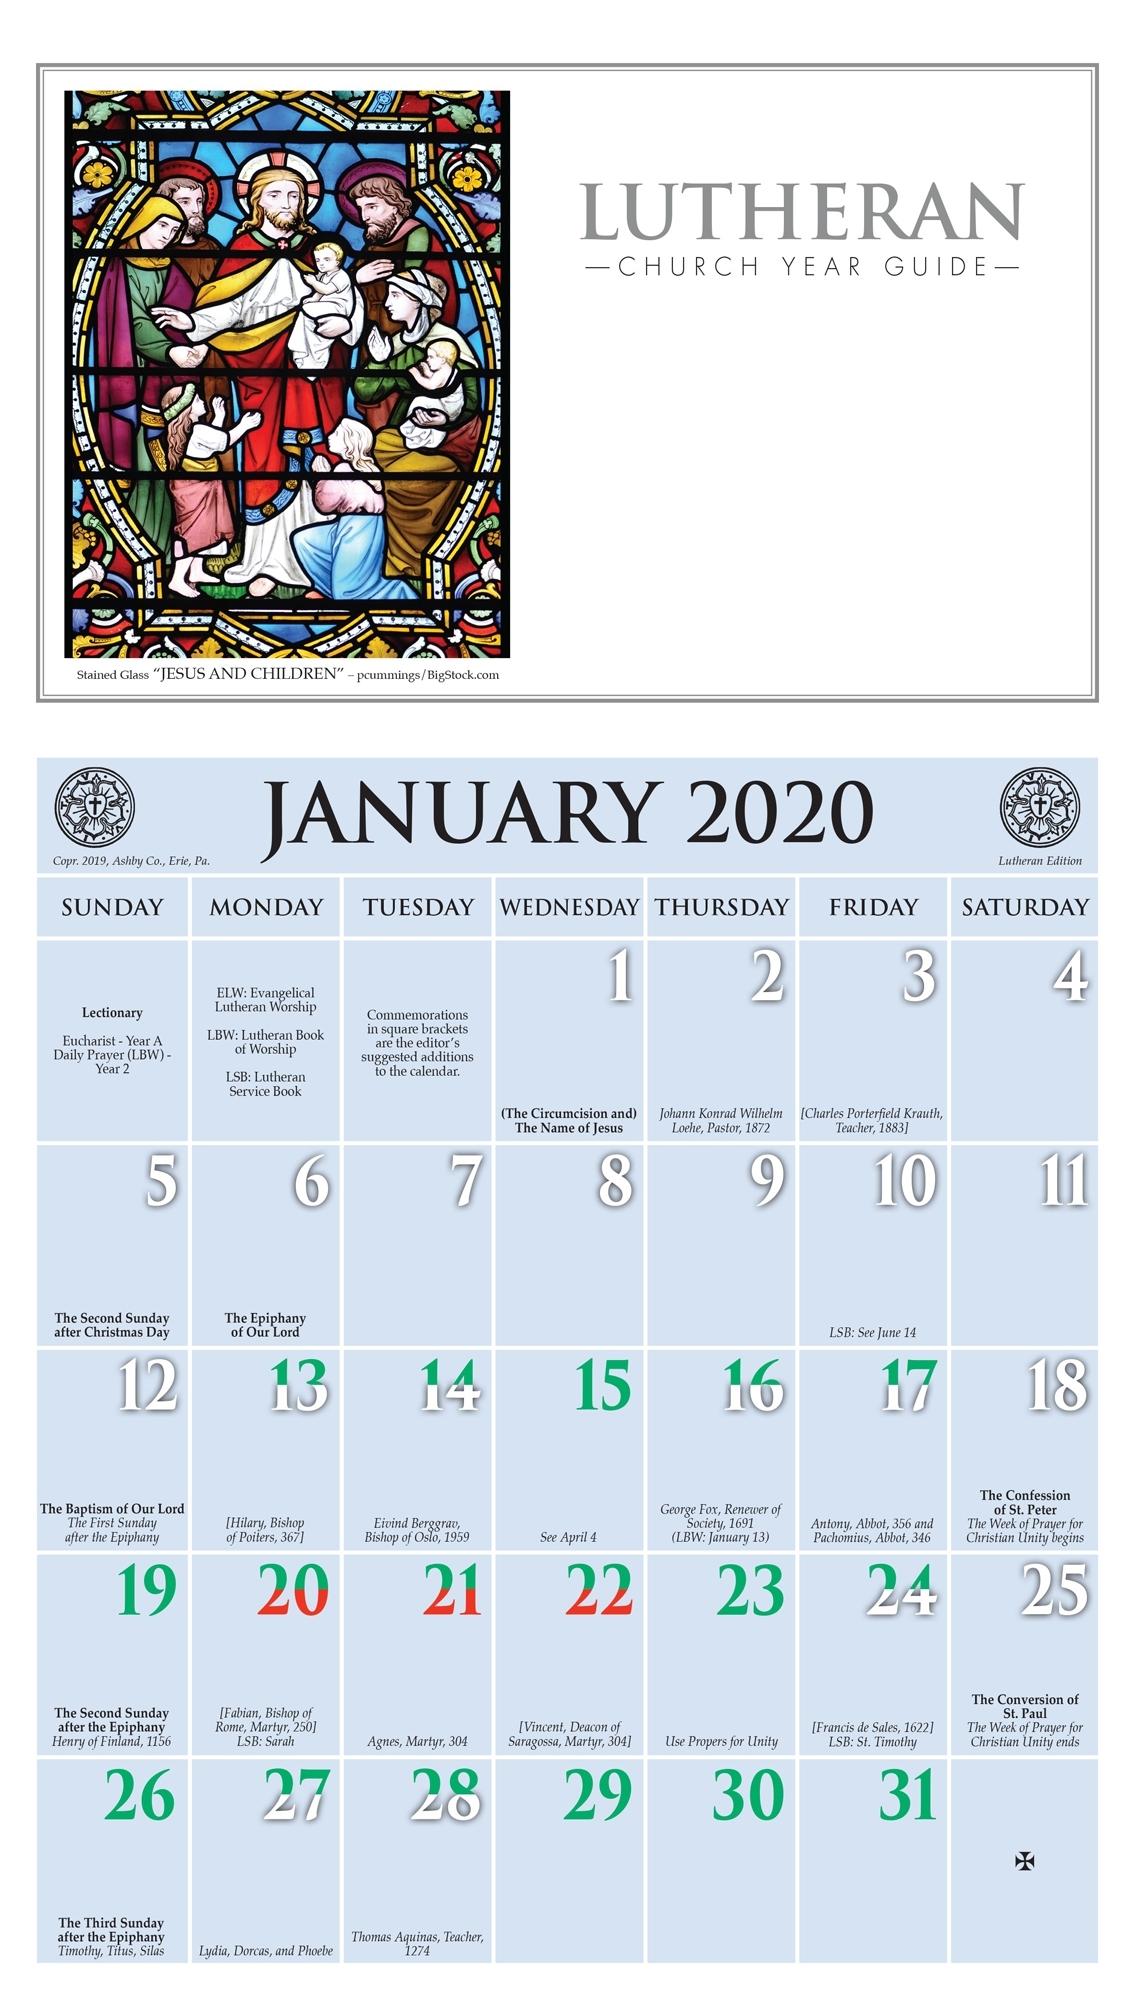 2020 Church Year Calendar regarding 2020 Liturgical Calendar With Dates